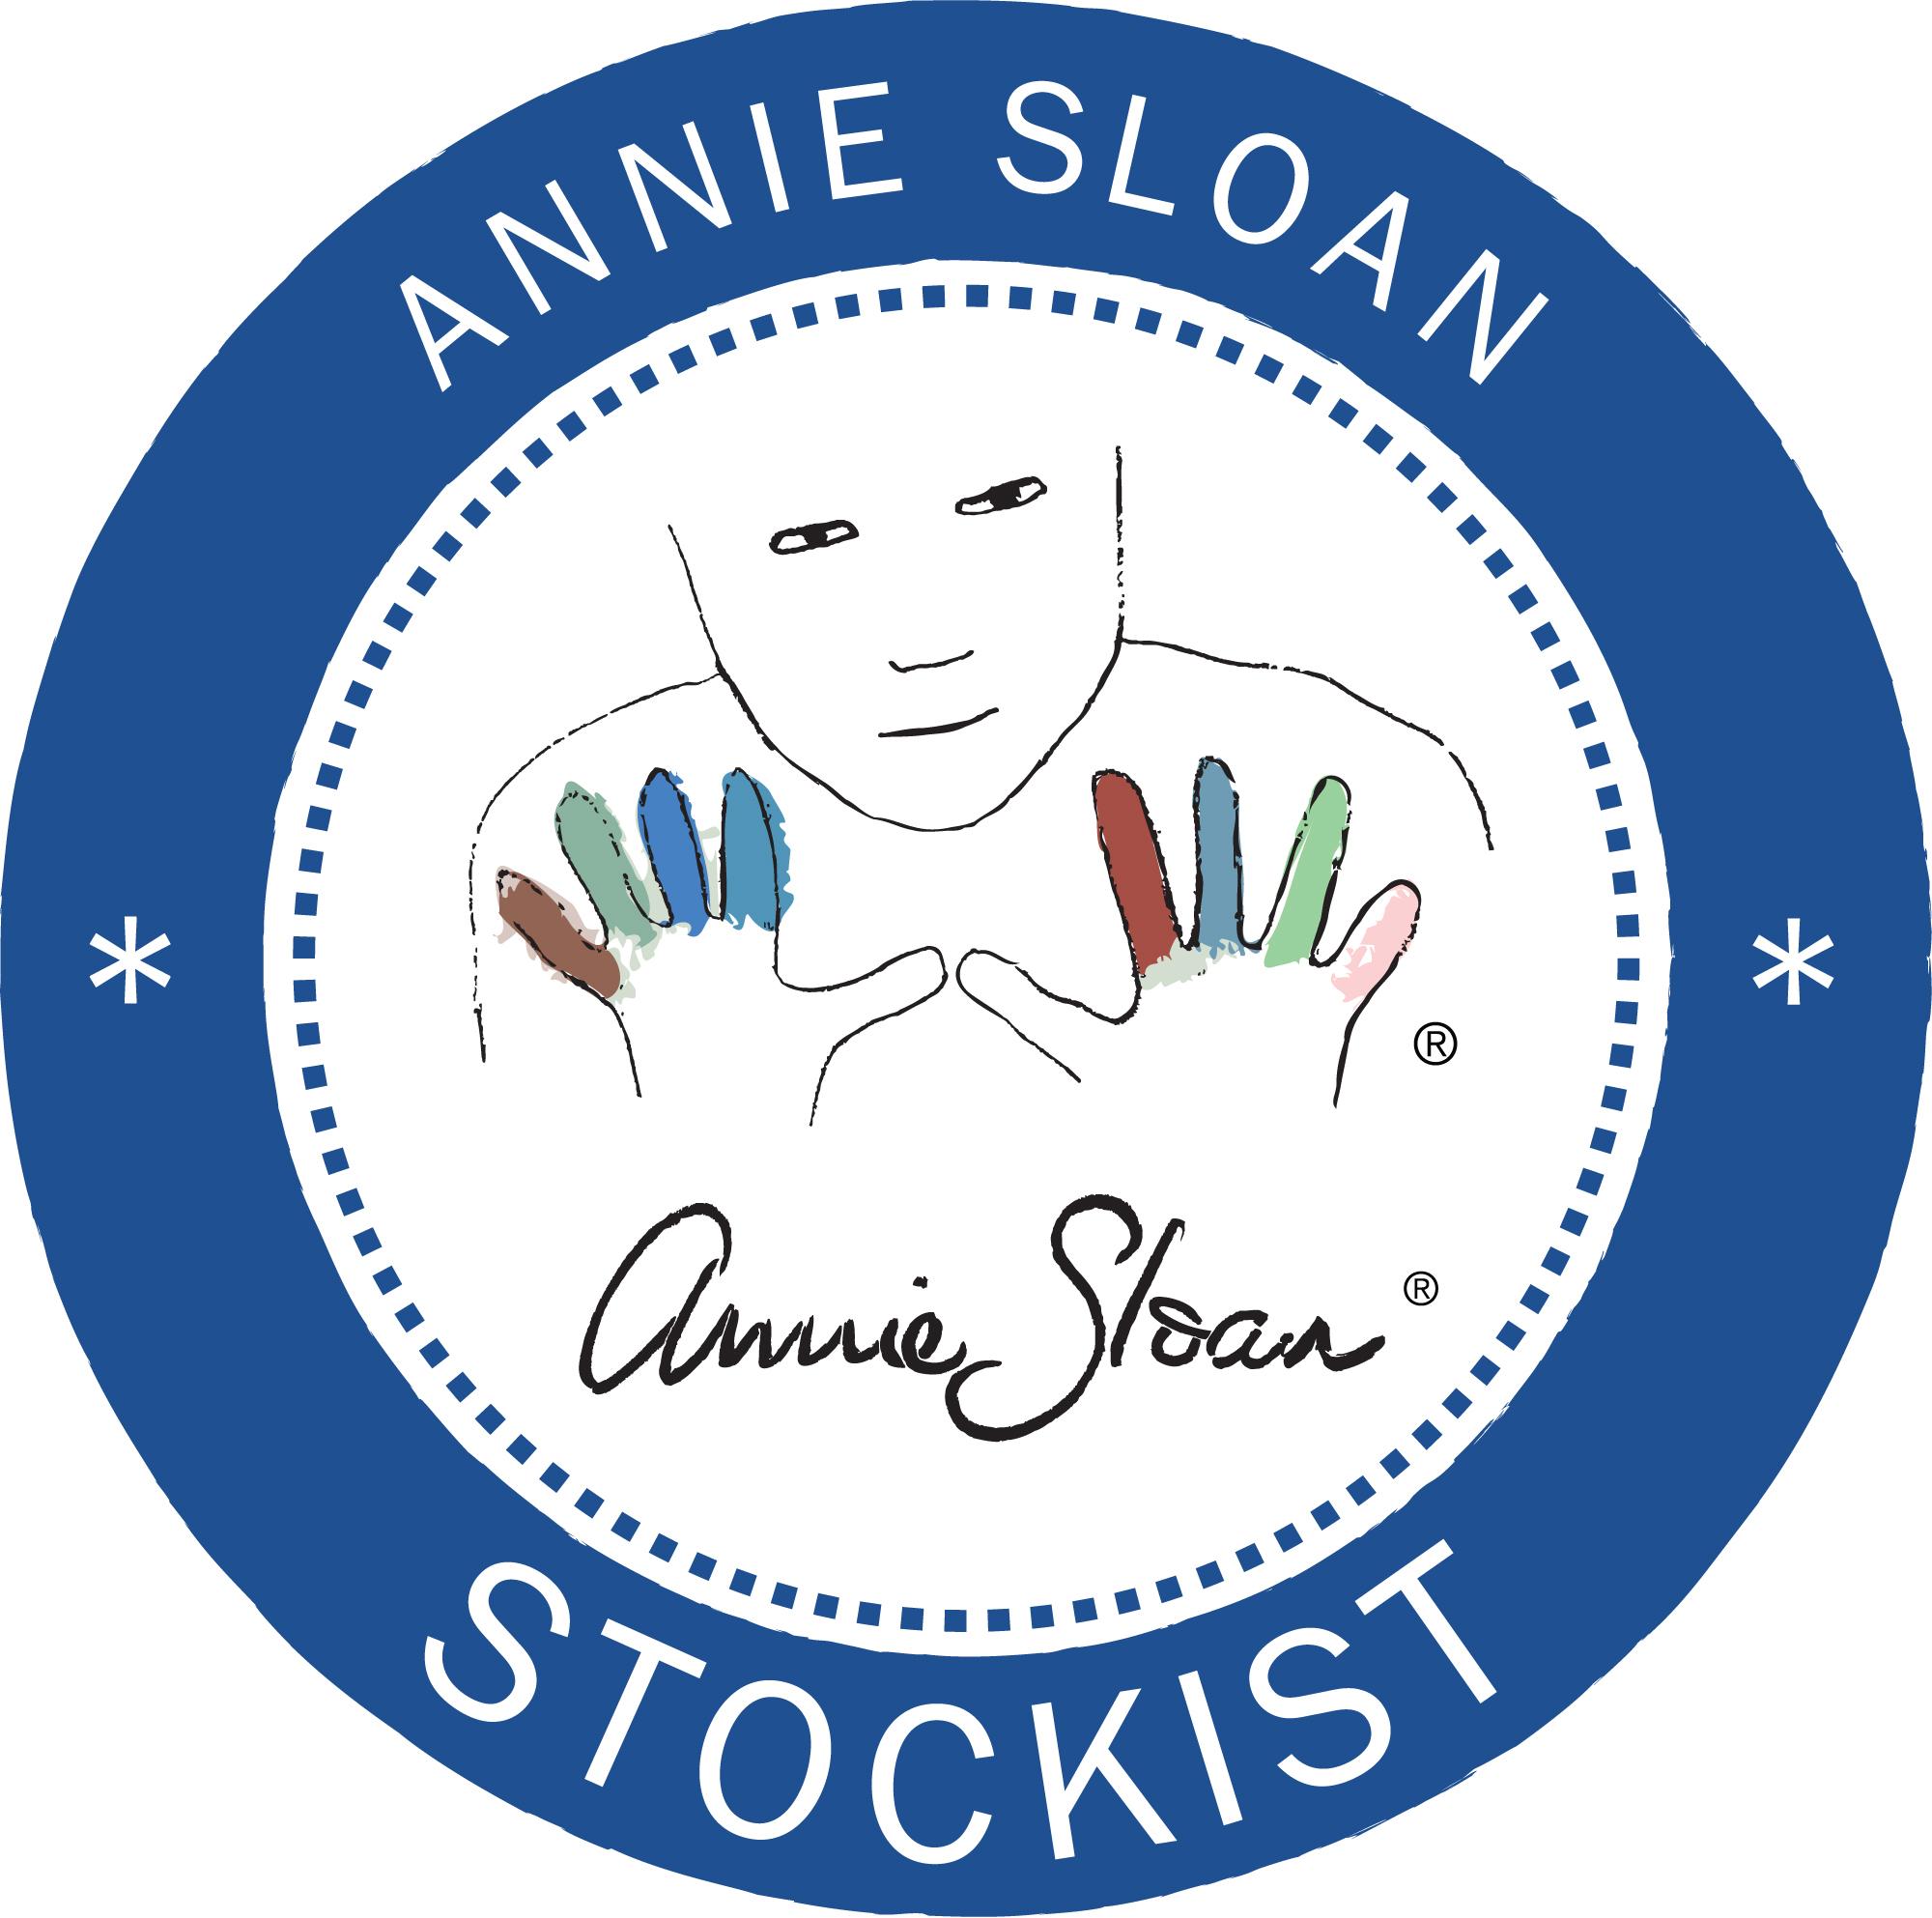 Annie Sloan - Stockist logo - Greek Blue.jpg